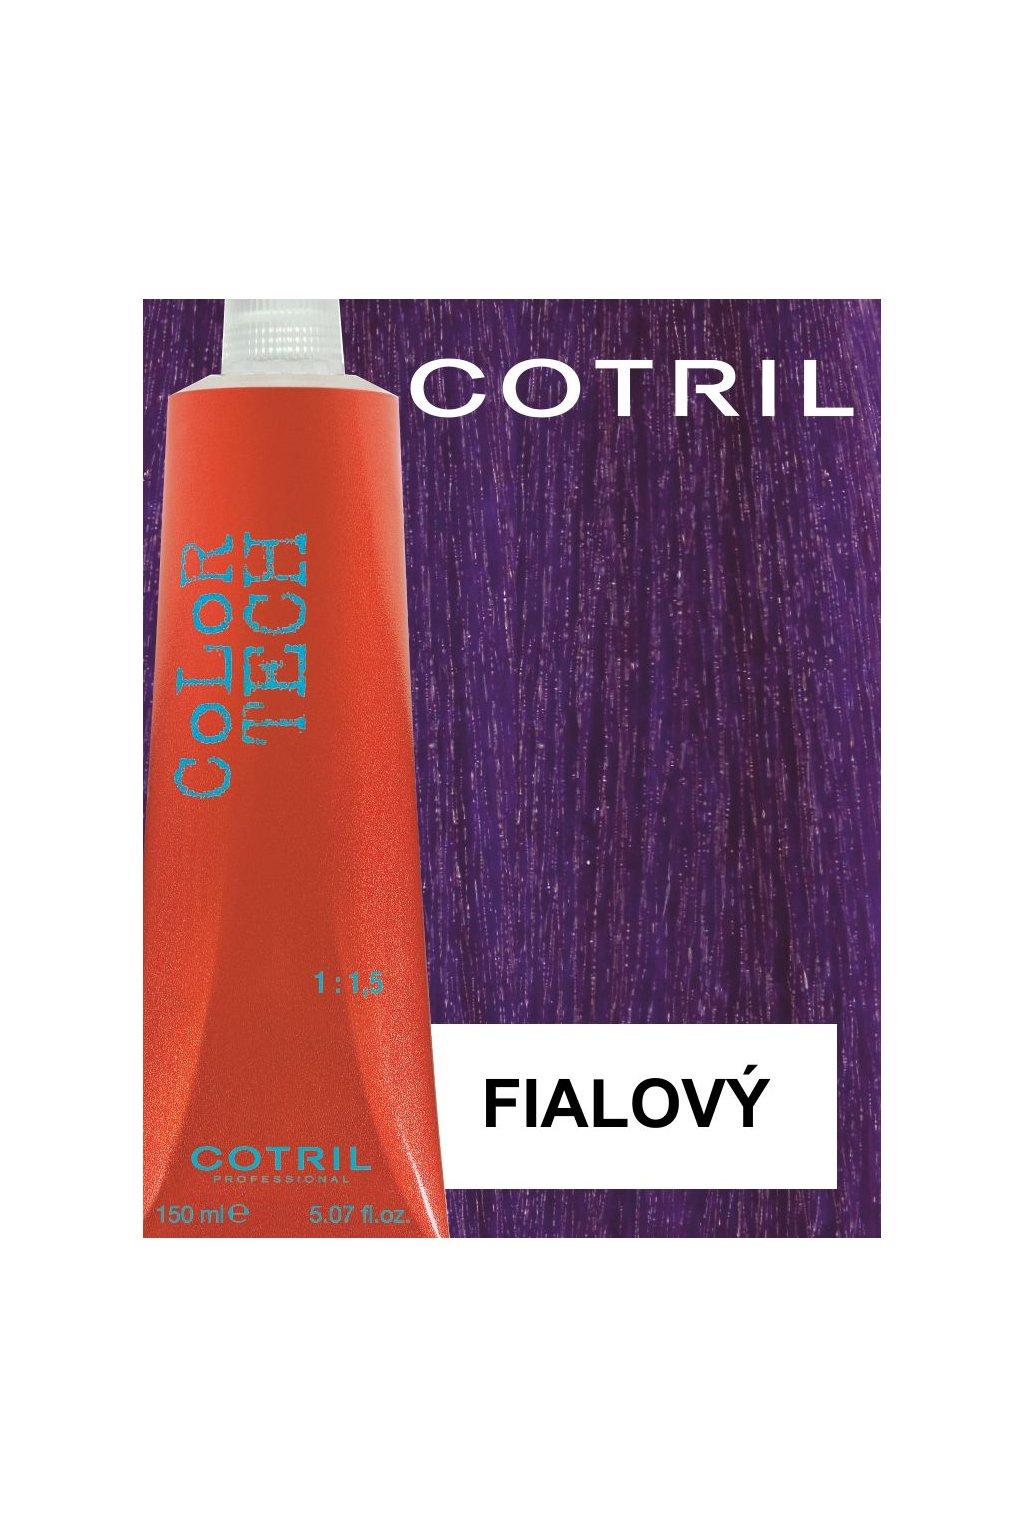 FIALOVY ct cotril